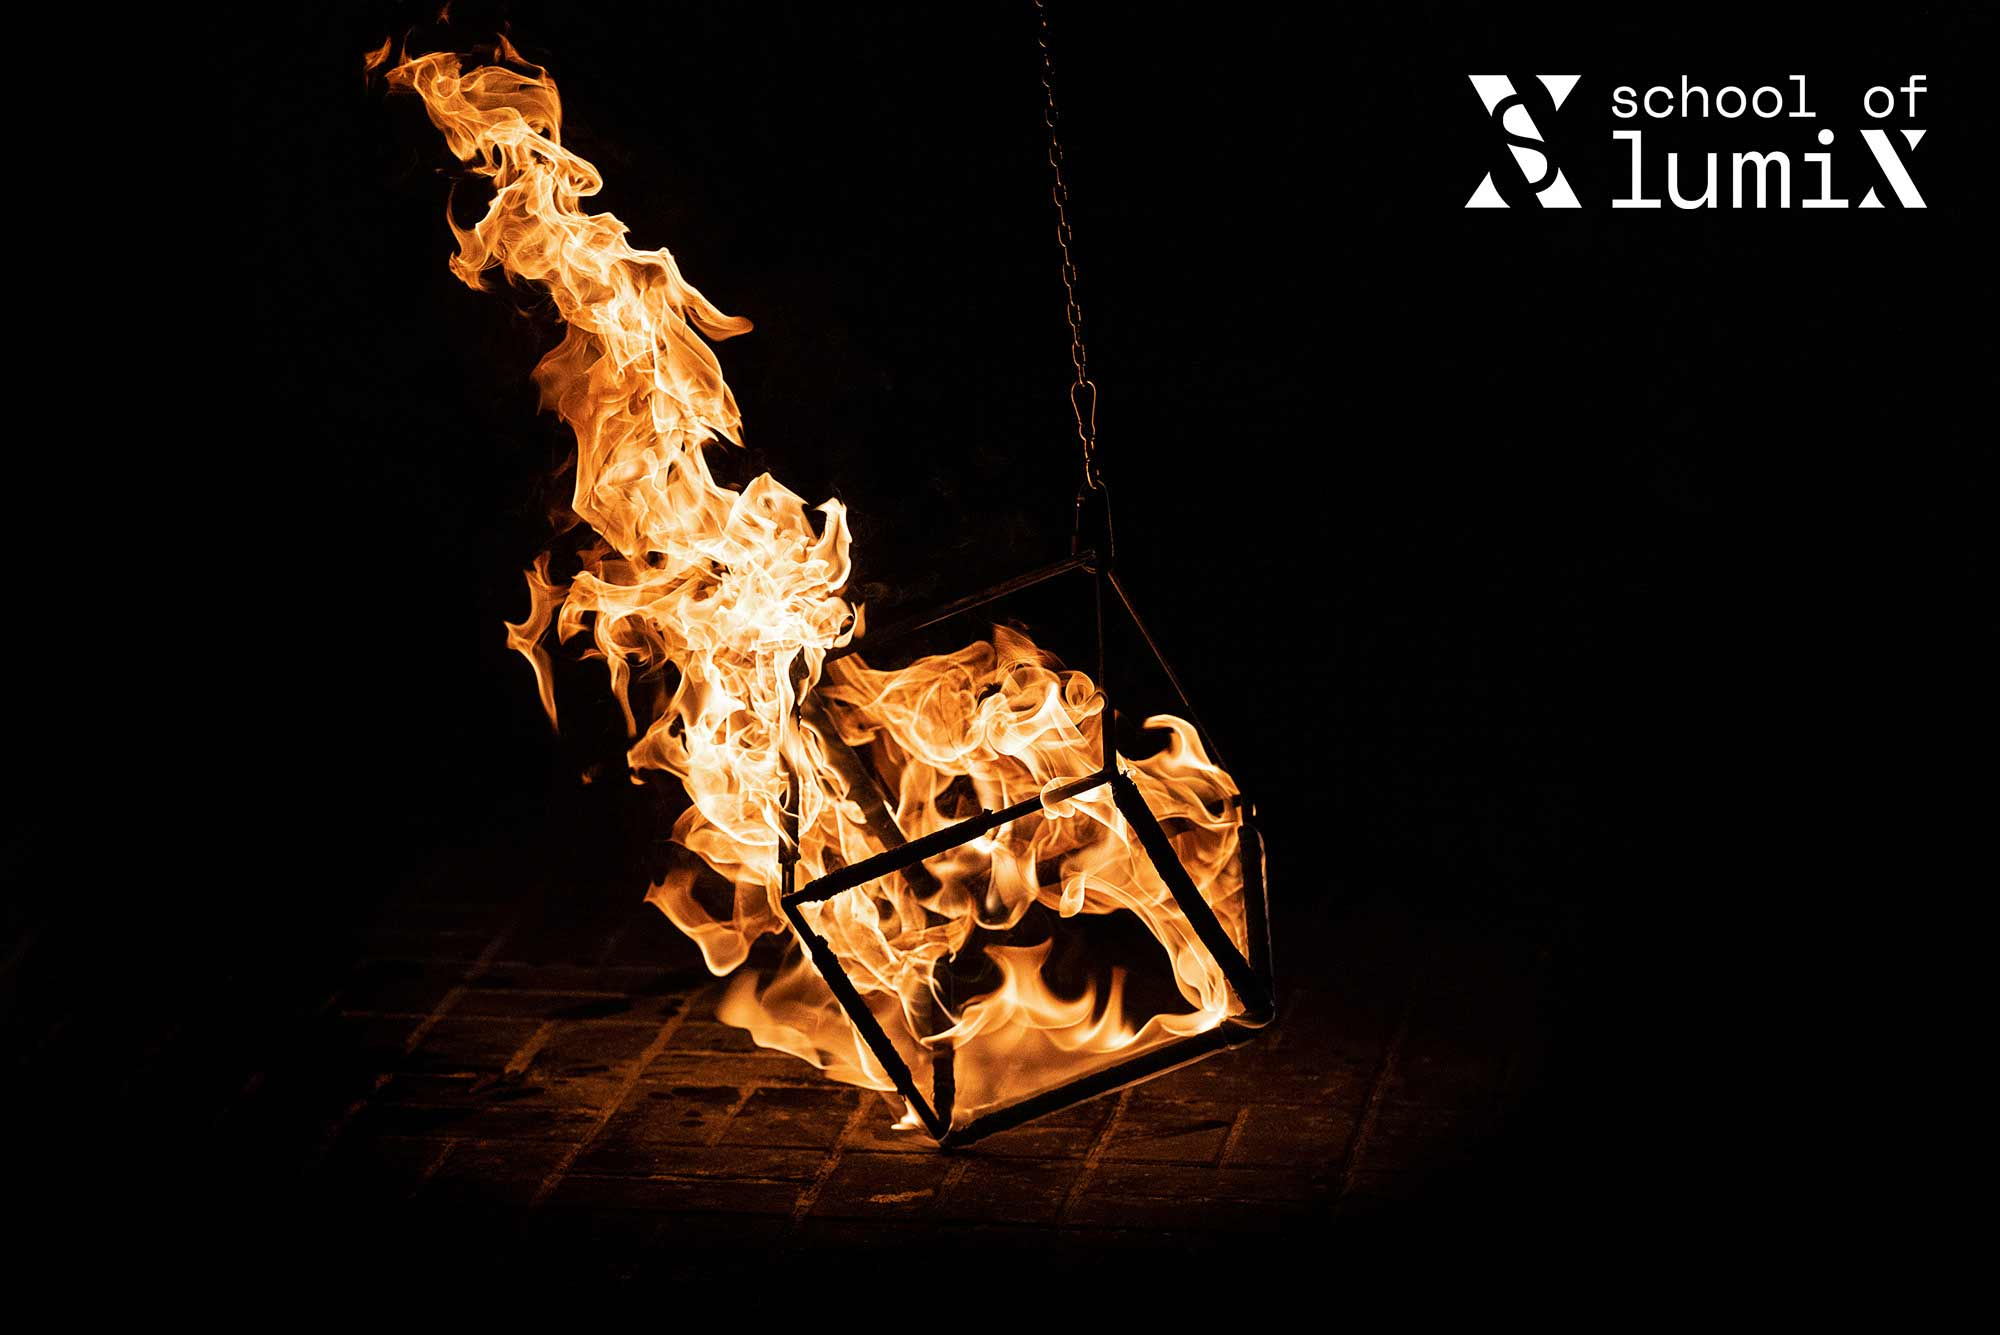 Panasonic Lumix Fotoevent Fire